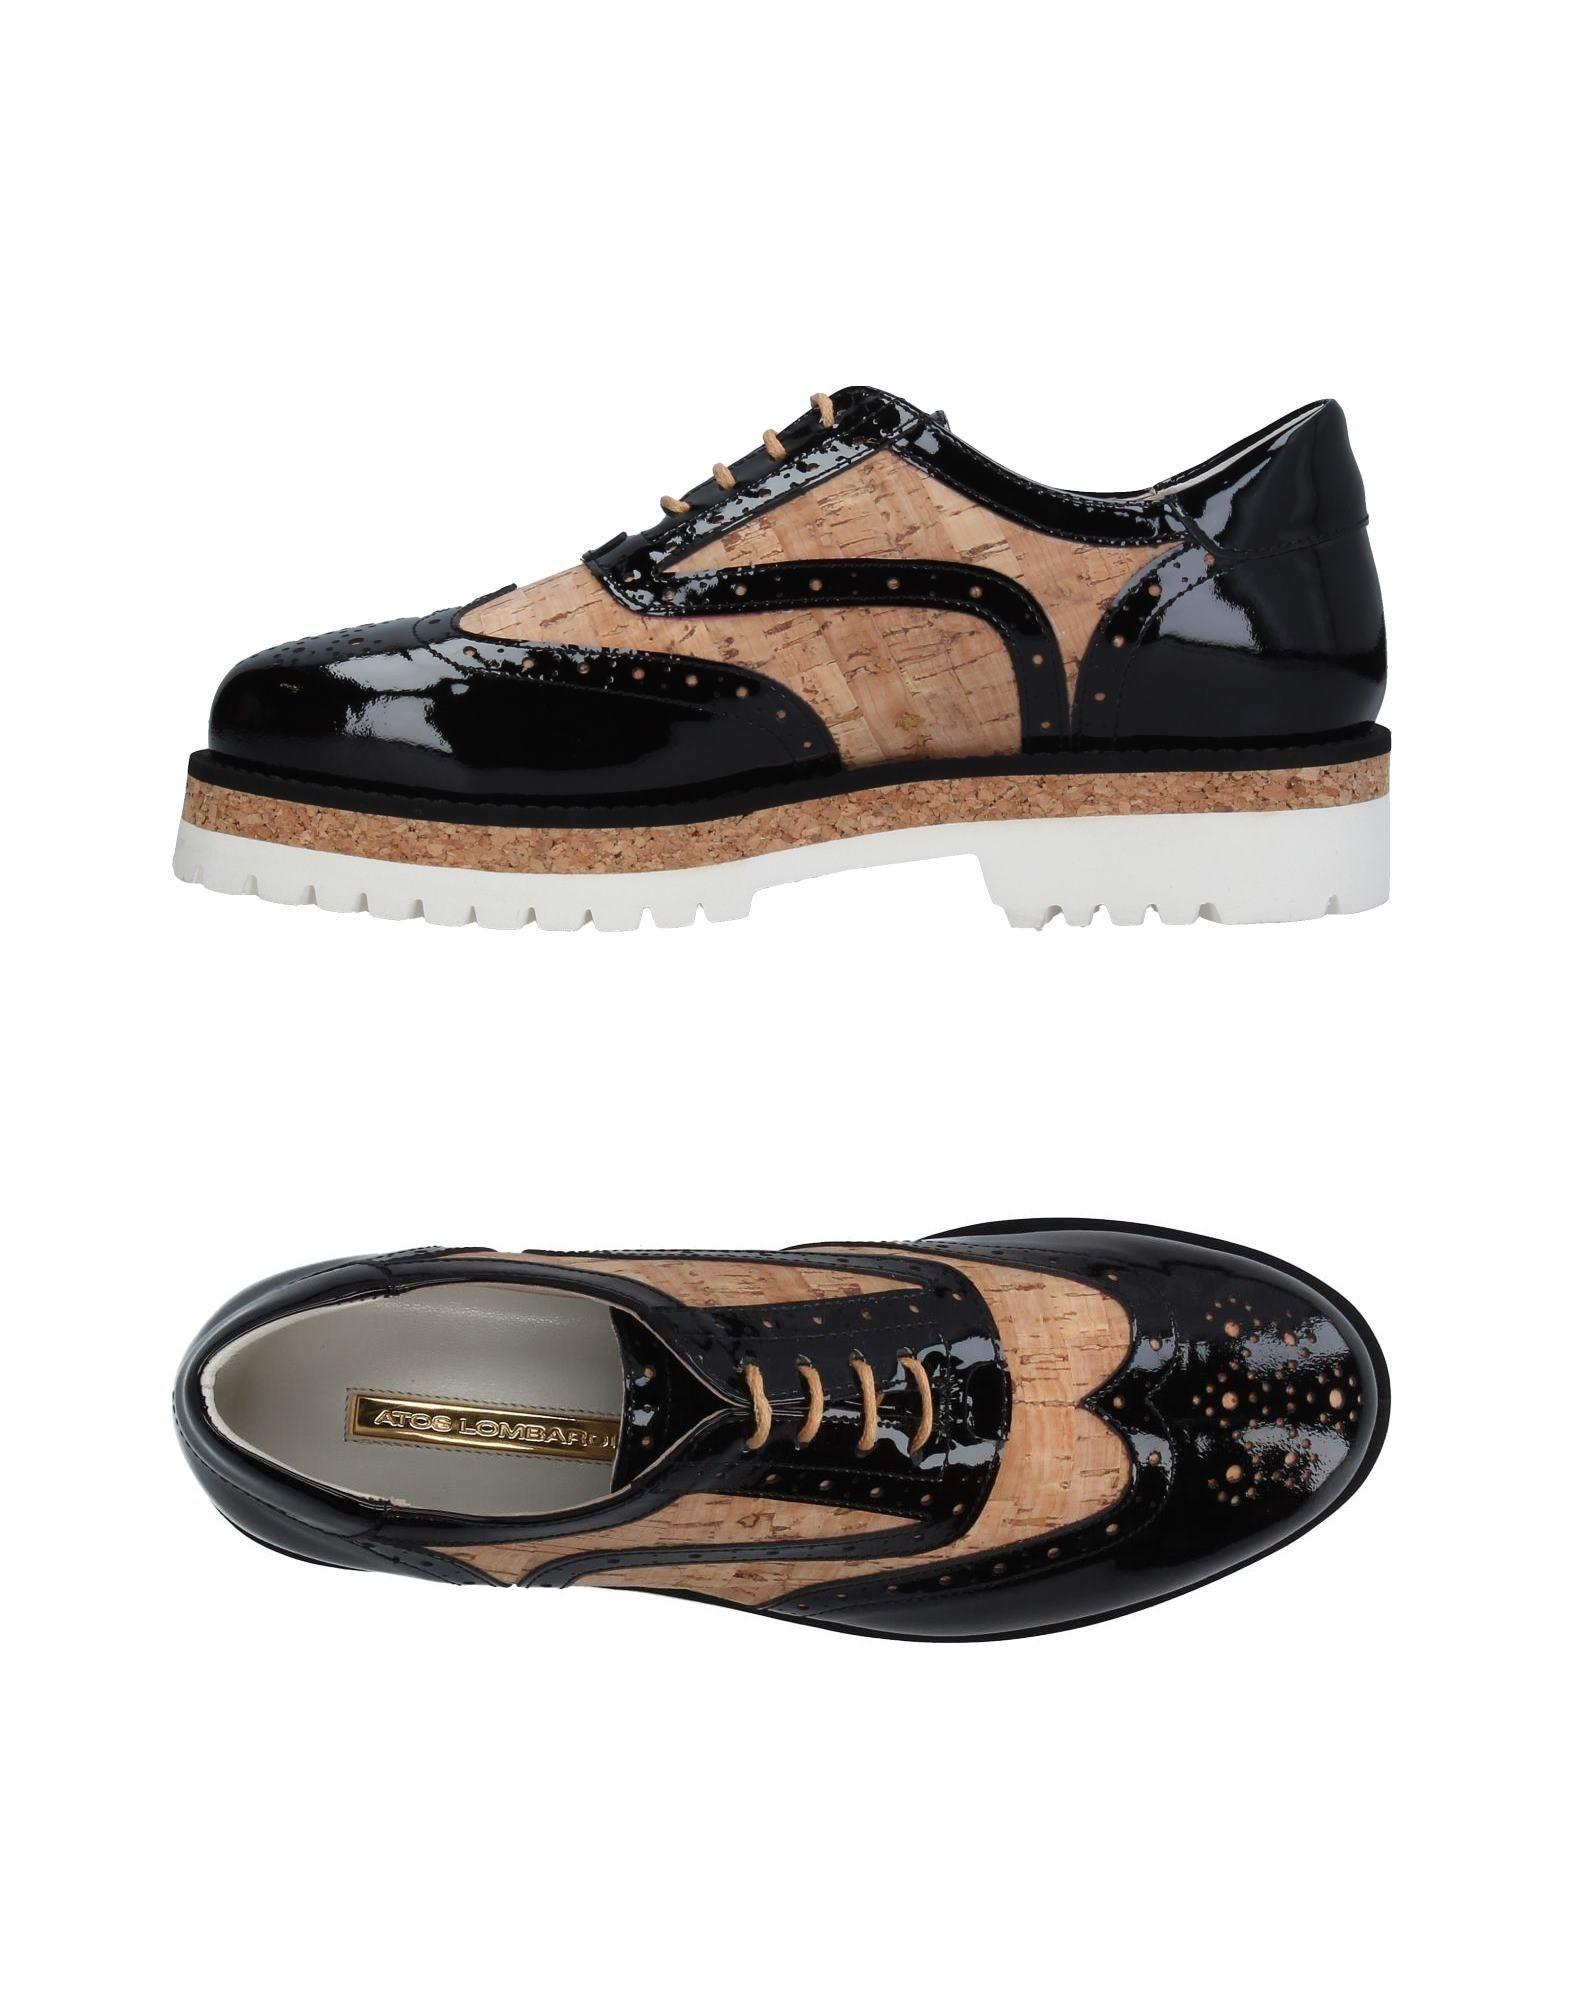 Atos Lombardini Schnürschuhe Damen  11326020NM Gute Qualität beliebte Schuhe